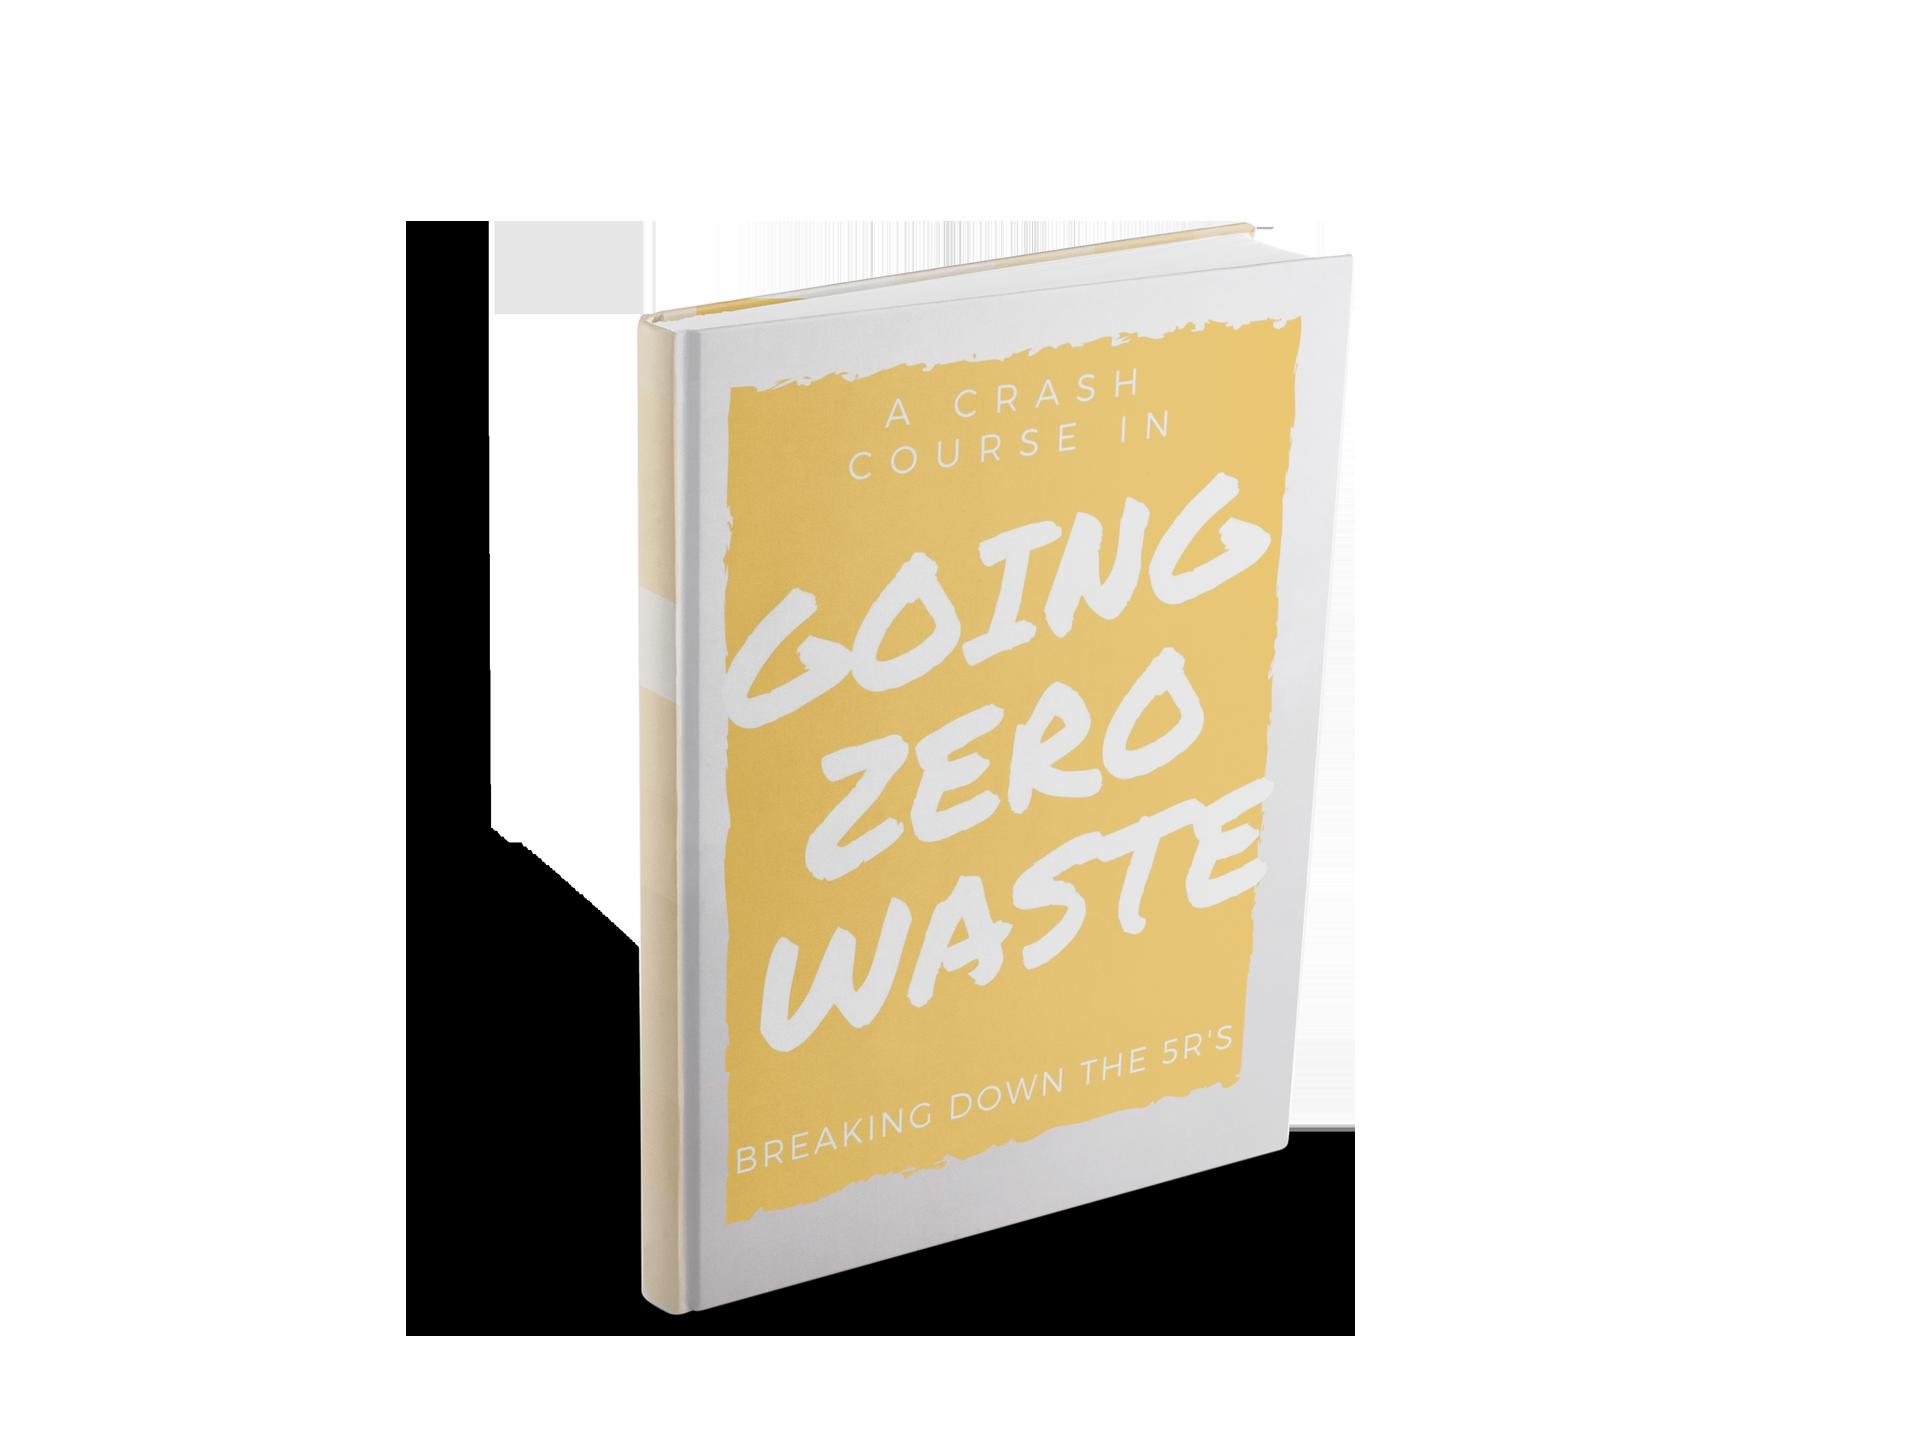 A zero waste eBook, A Crash Course in Going Zero Waste from www.goingzerowaste.com